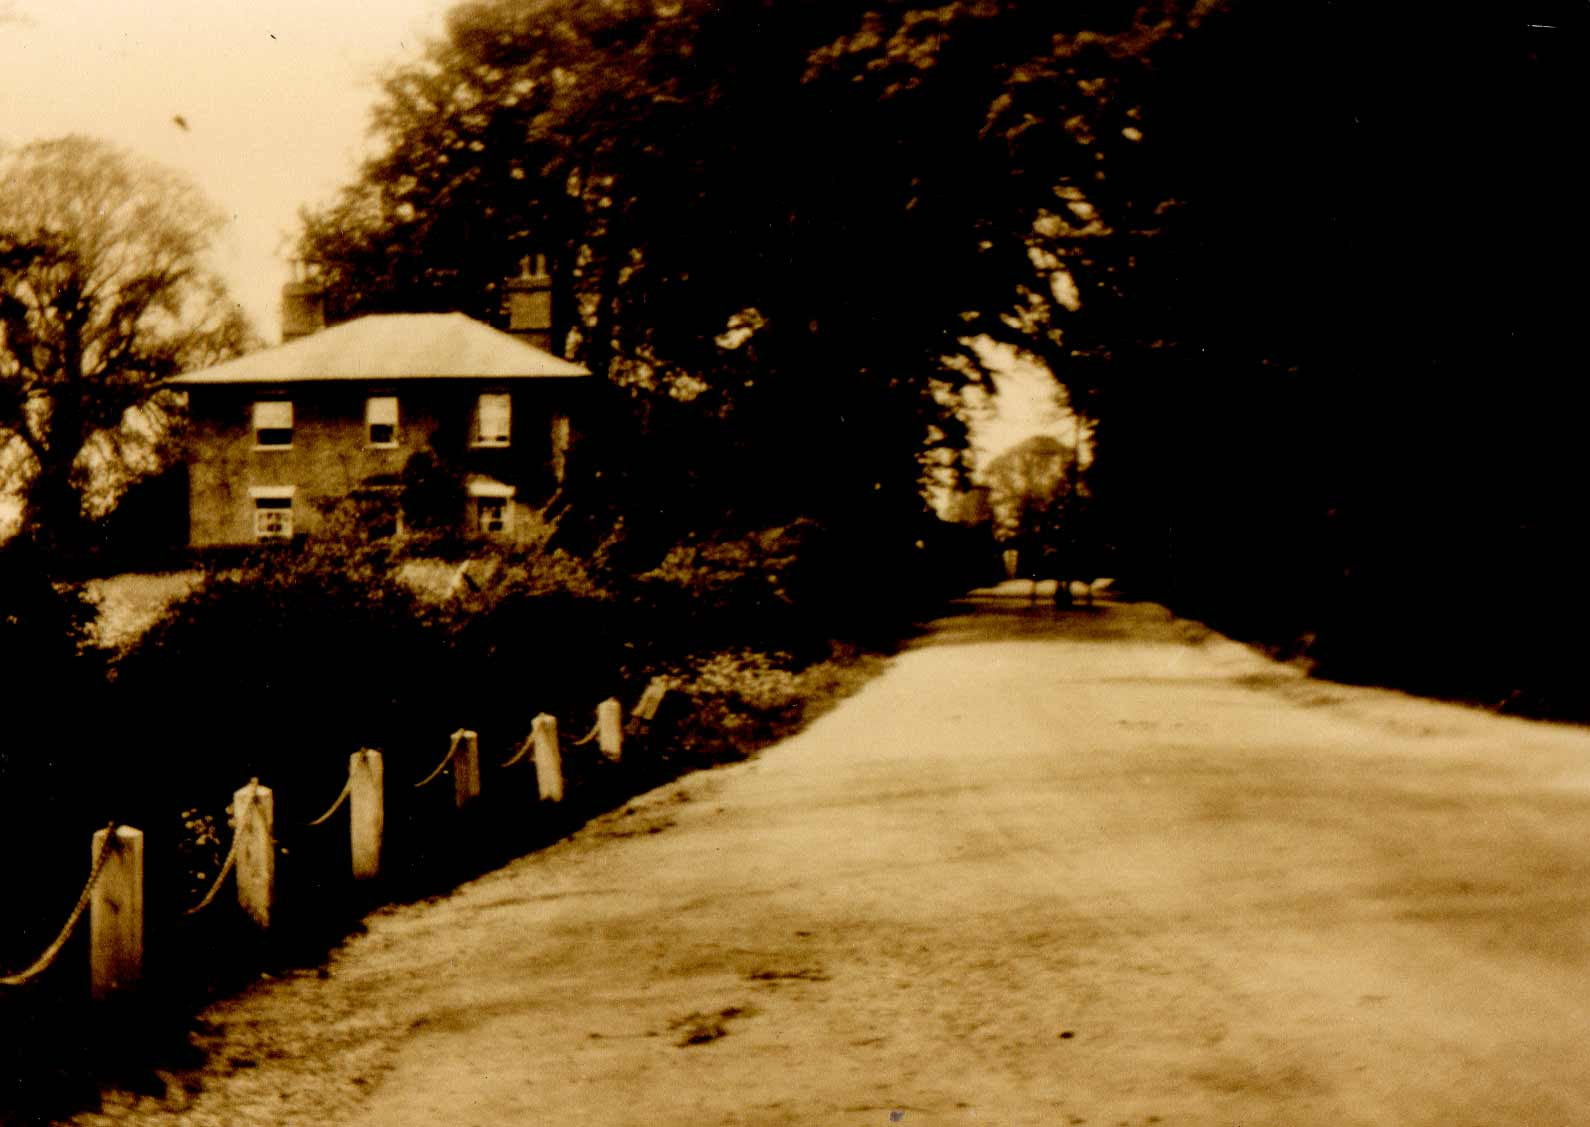 Wethersfield Vicarage